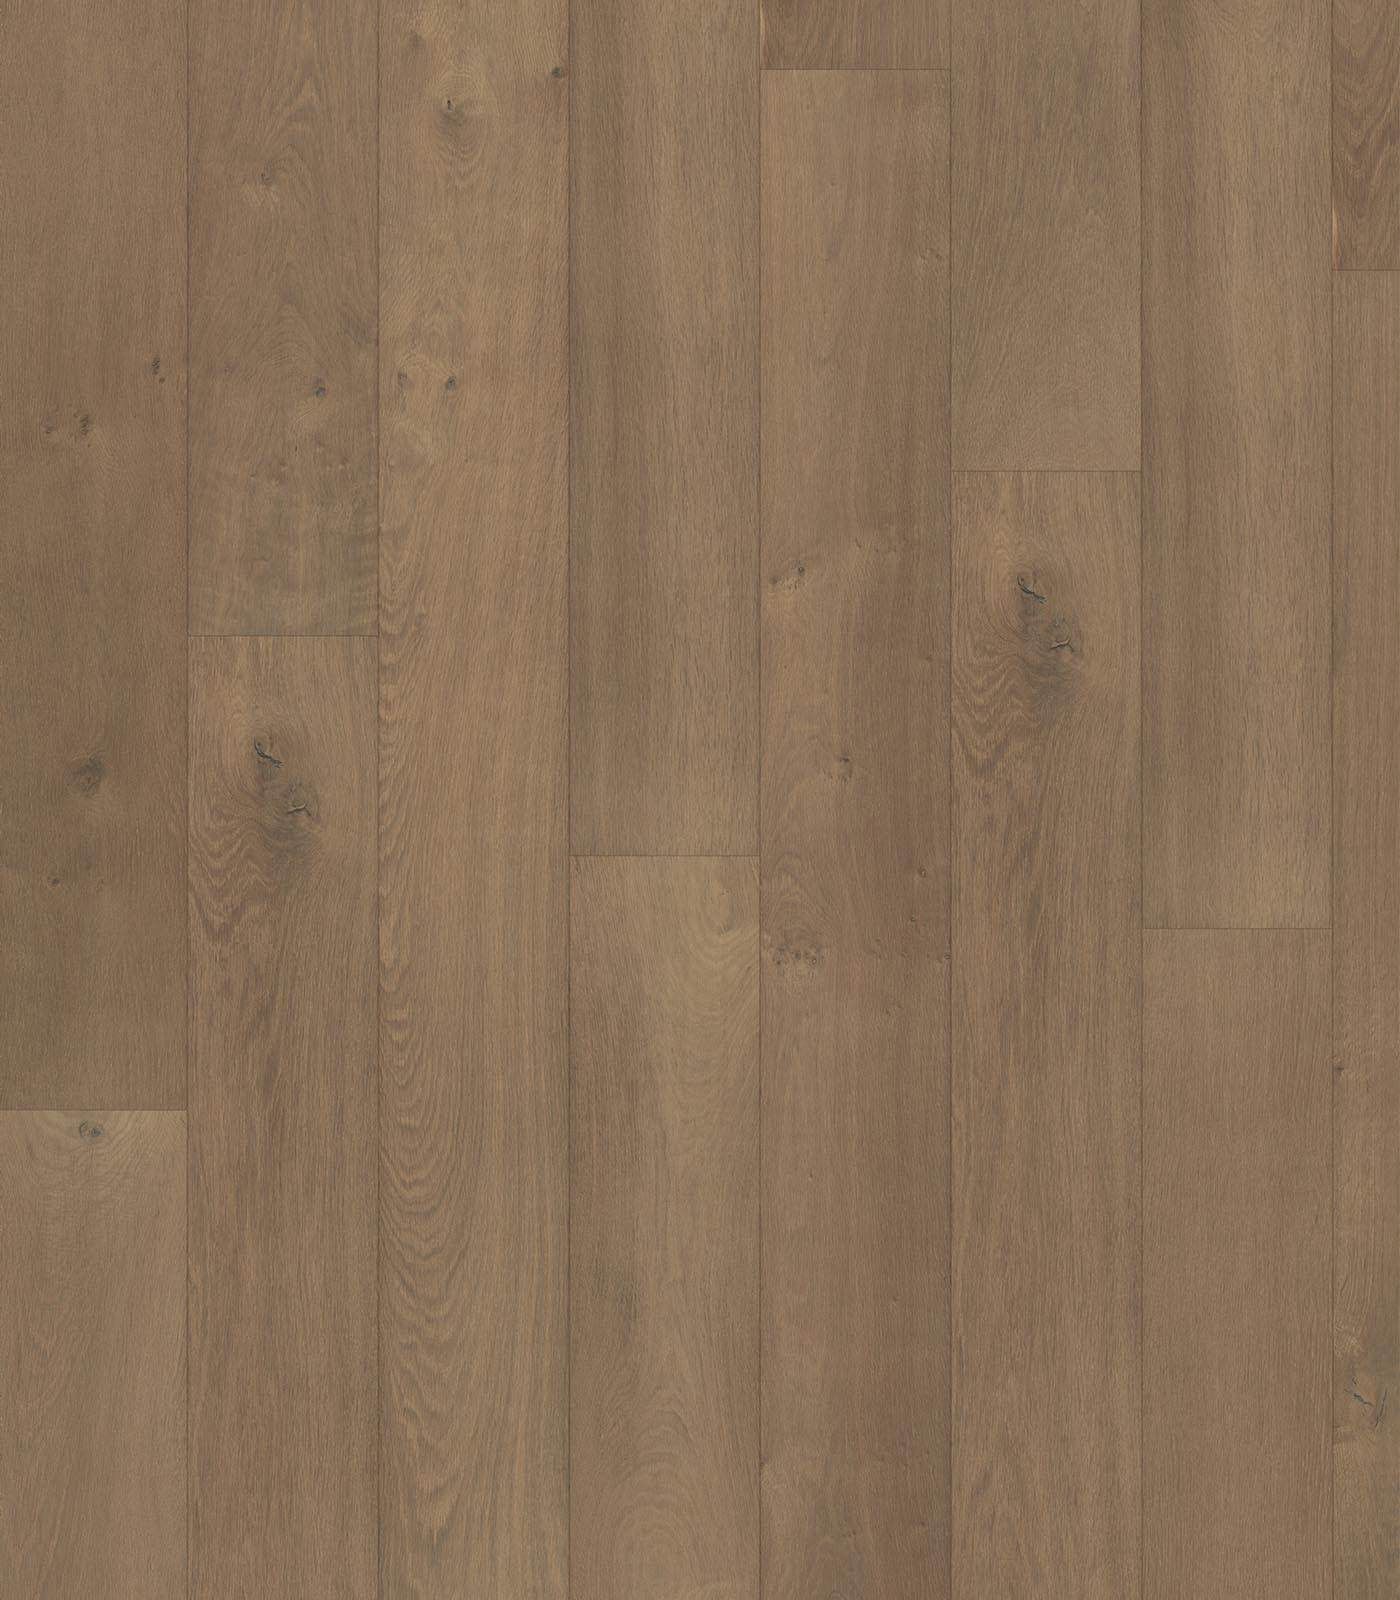 Verbier-Lifestyle Collection-European Oak floors-flat